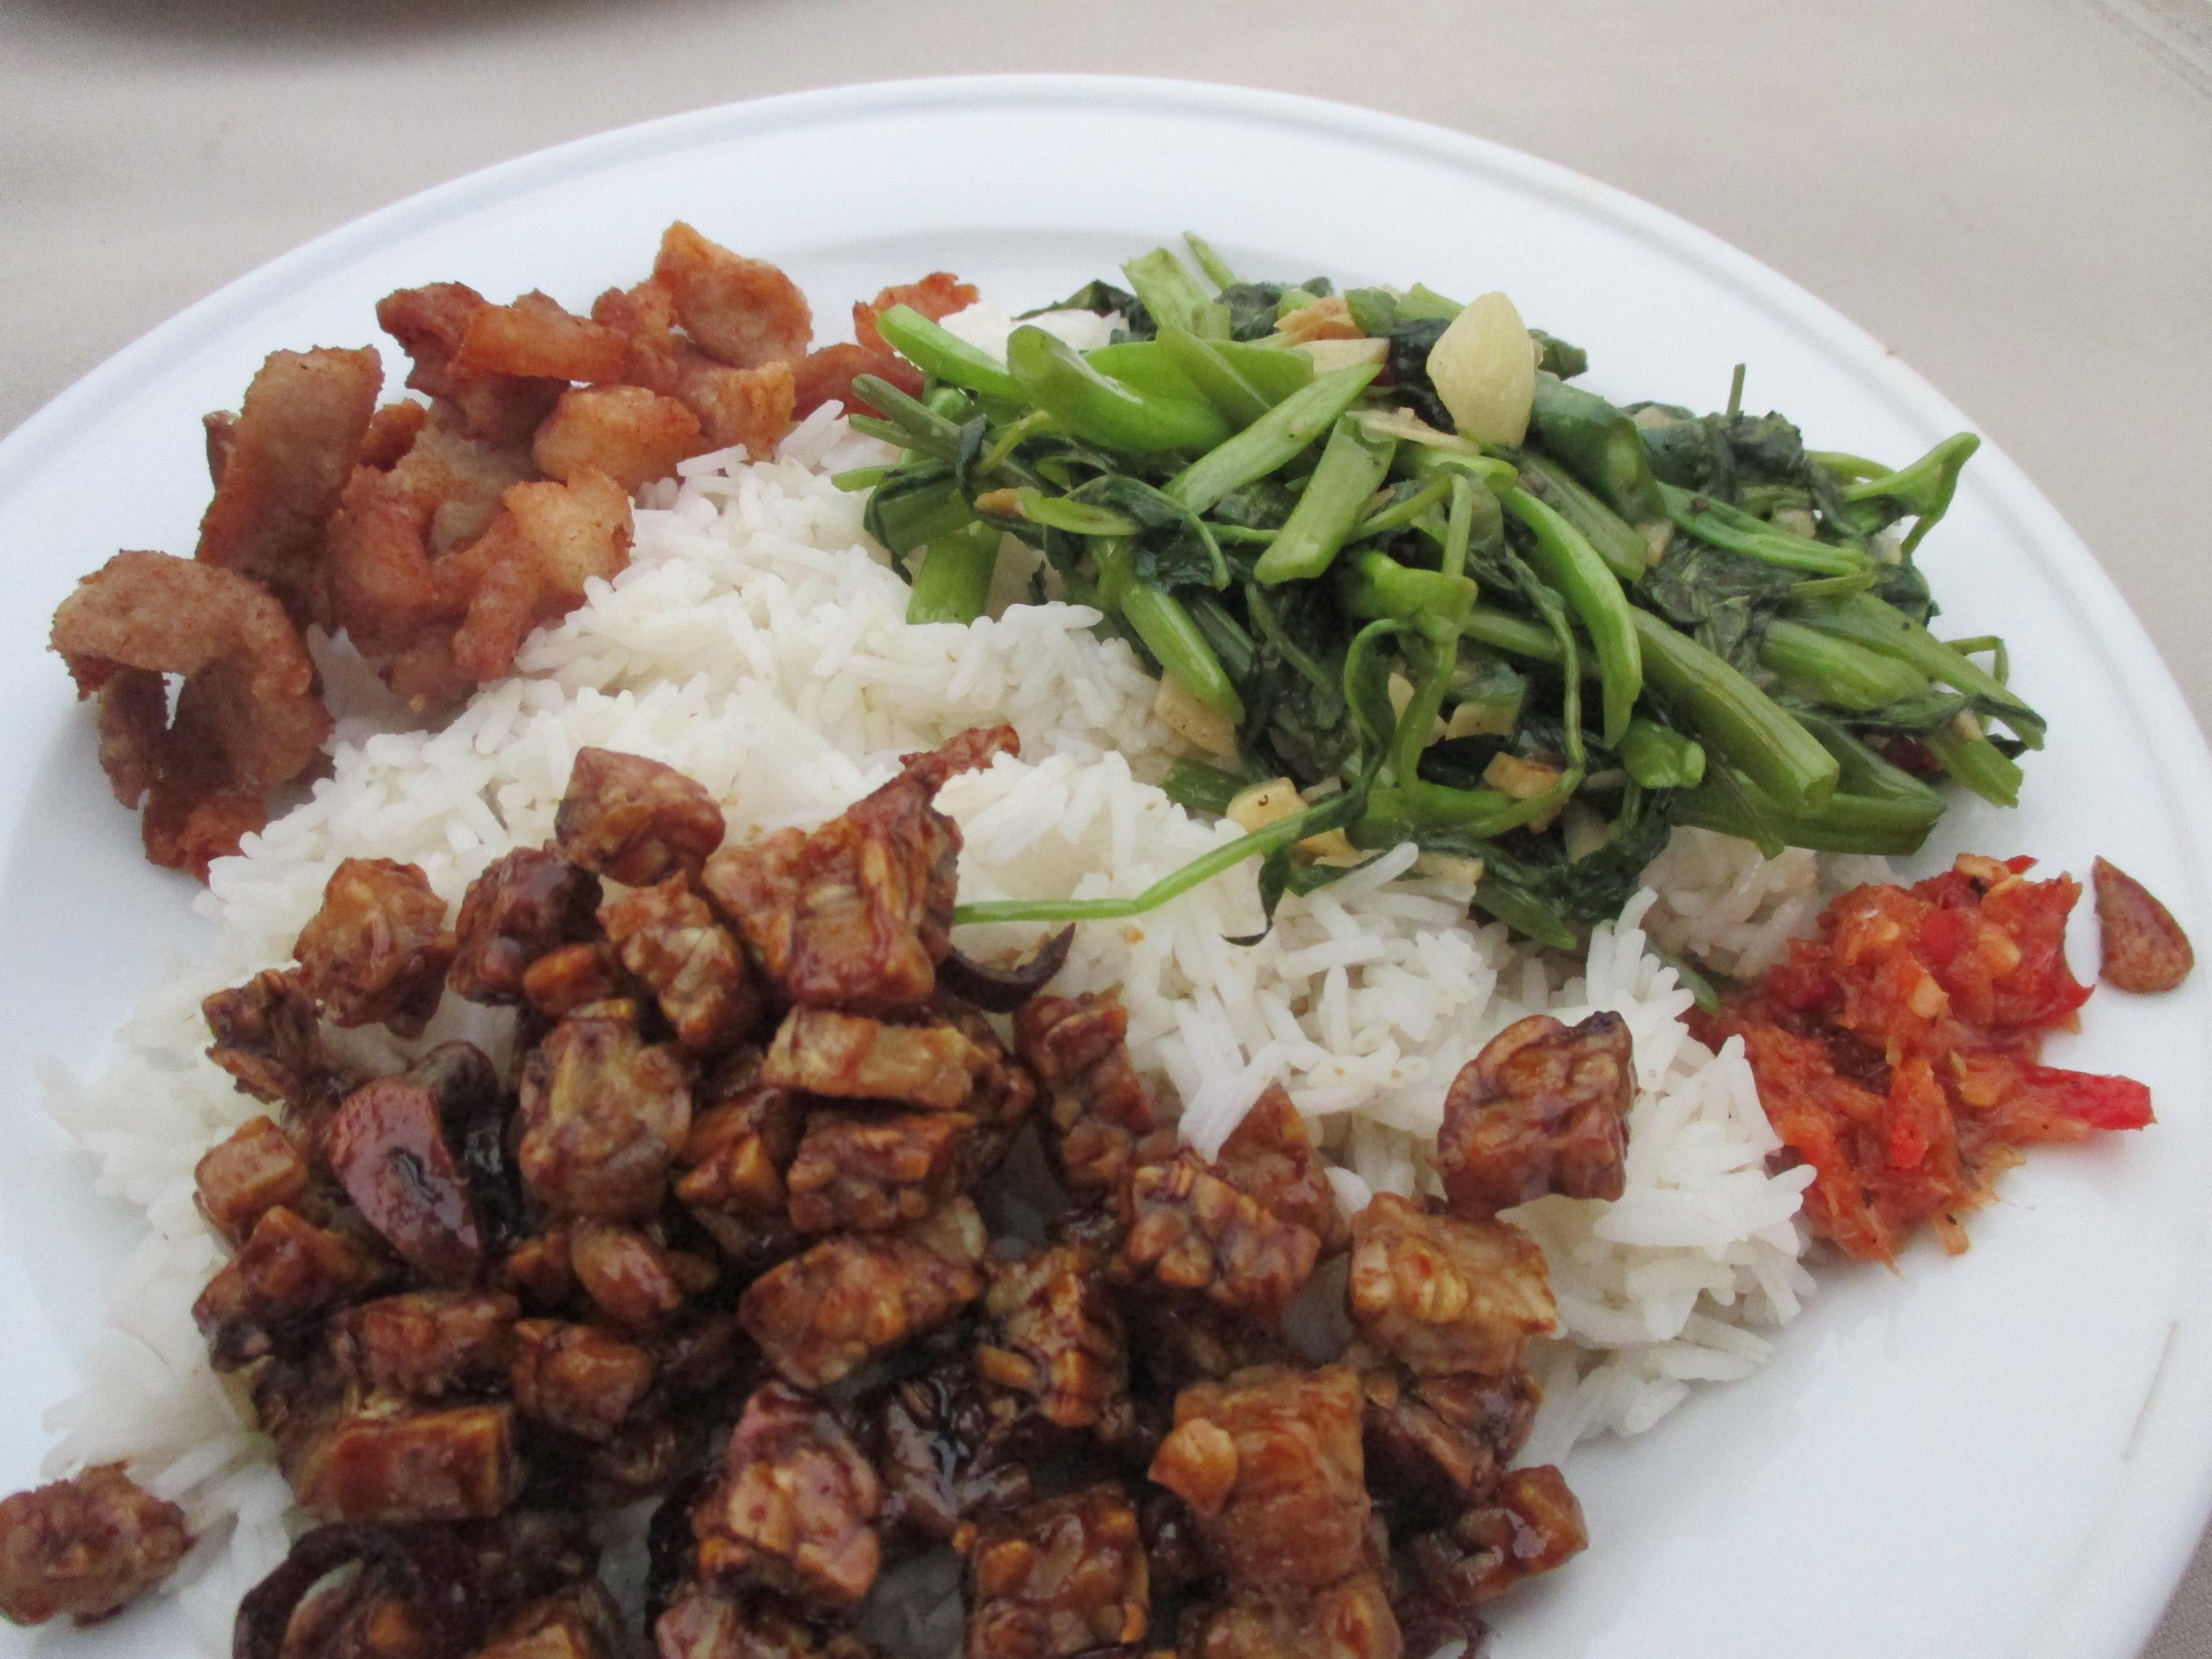 Nasi Campur - rice, crispy pork, tempe, kangkung (water spinach) and chilli sambal